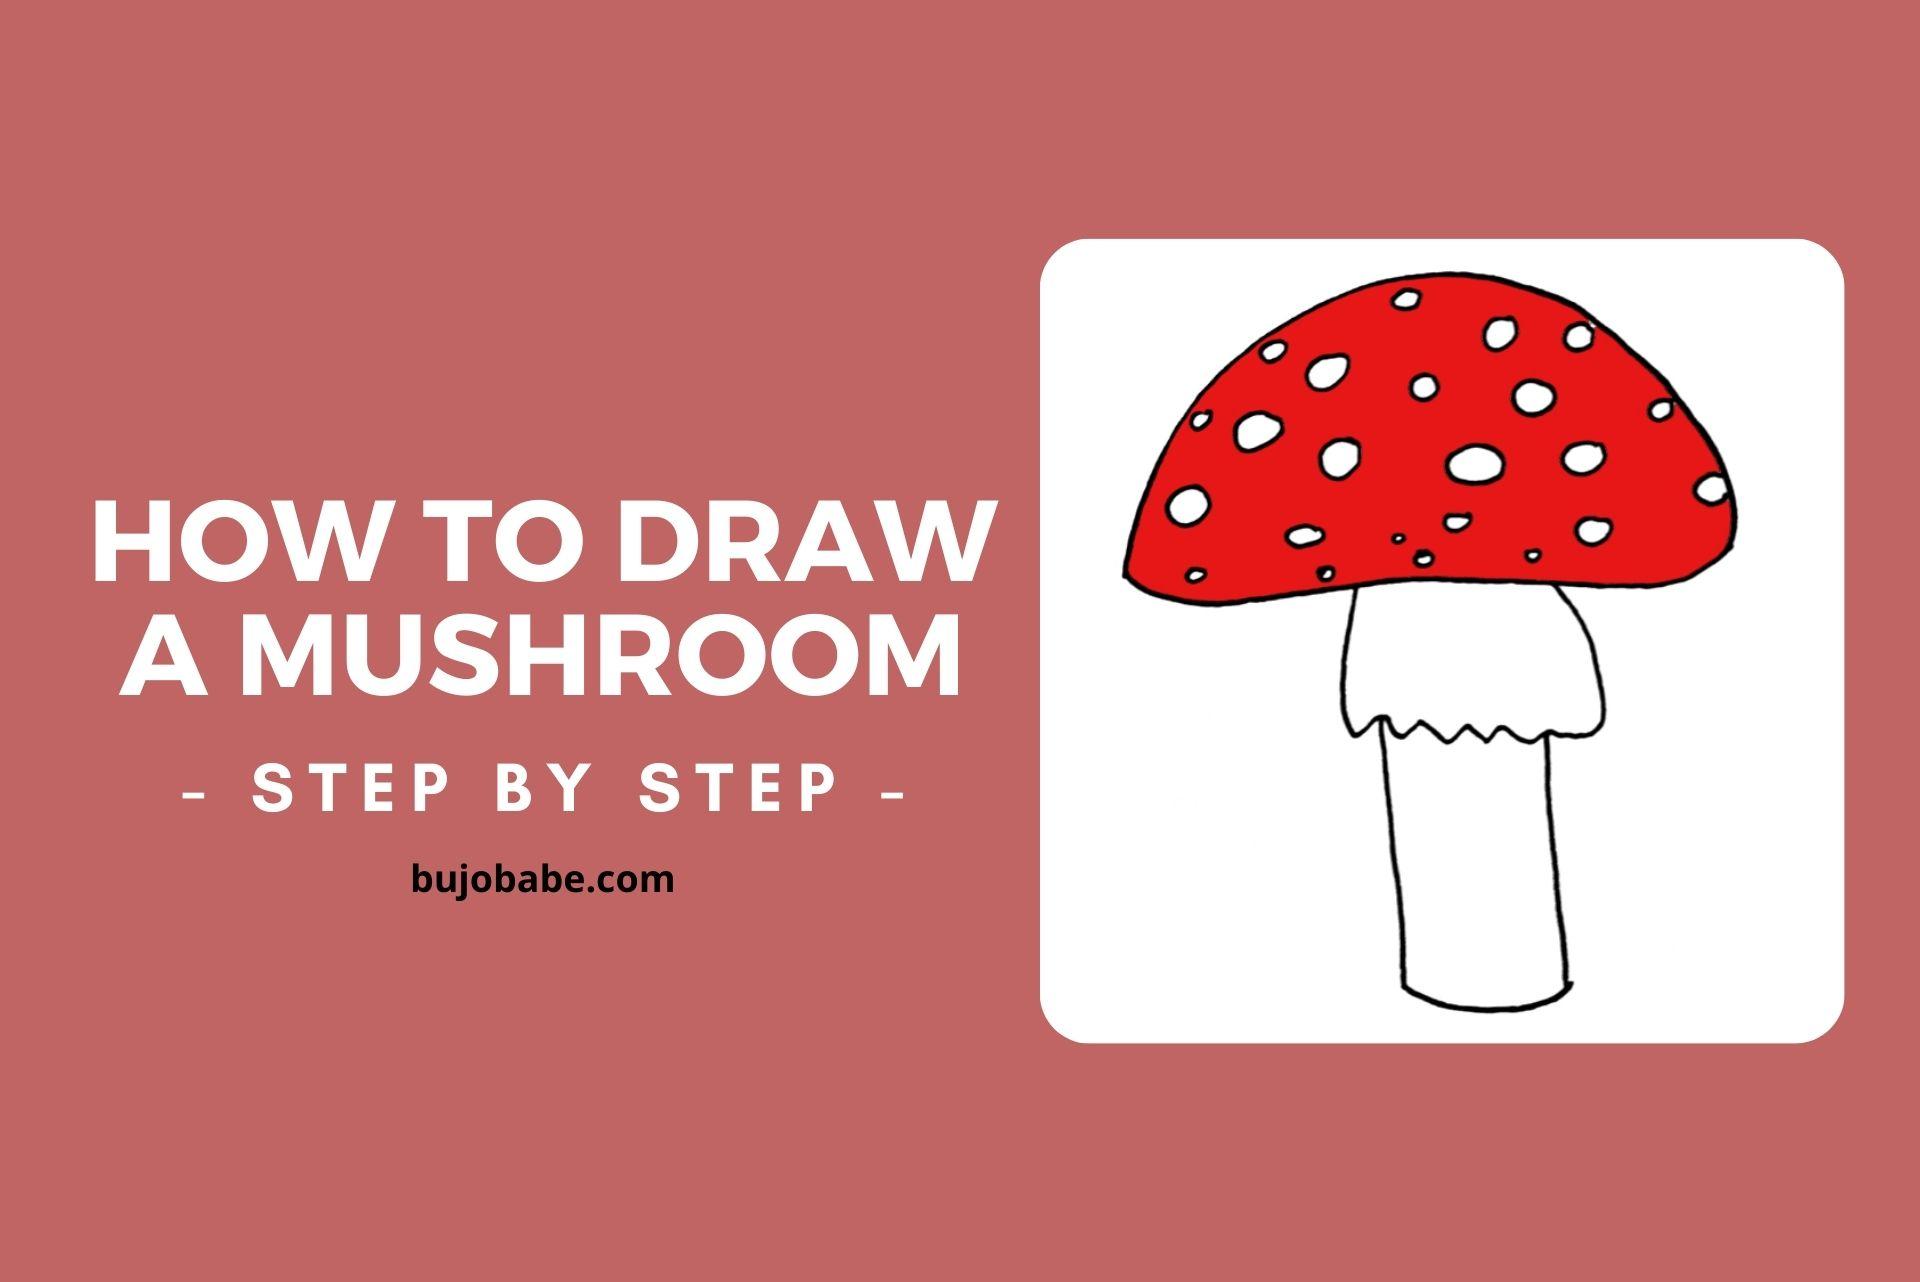 how to draw a mushroom step by step, mushroom drawing tutorial